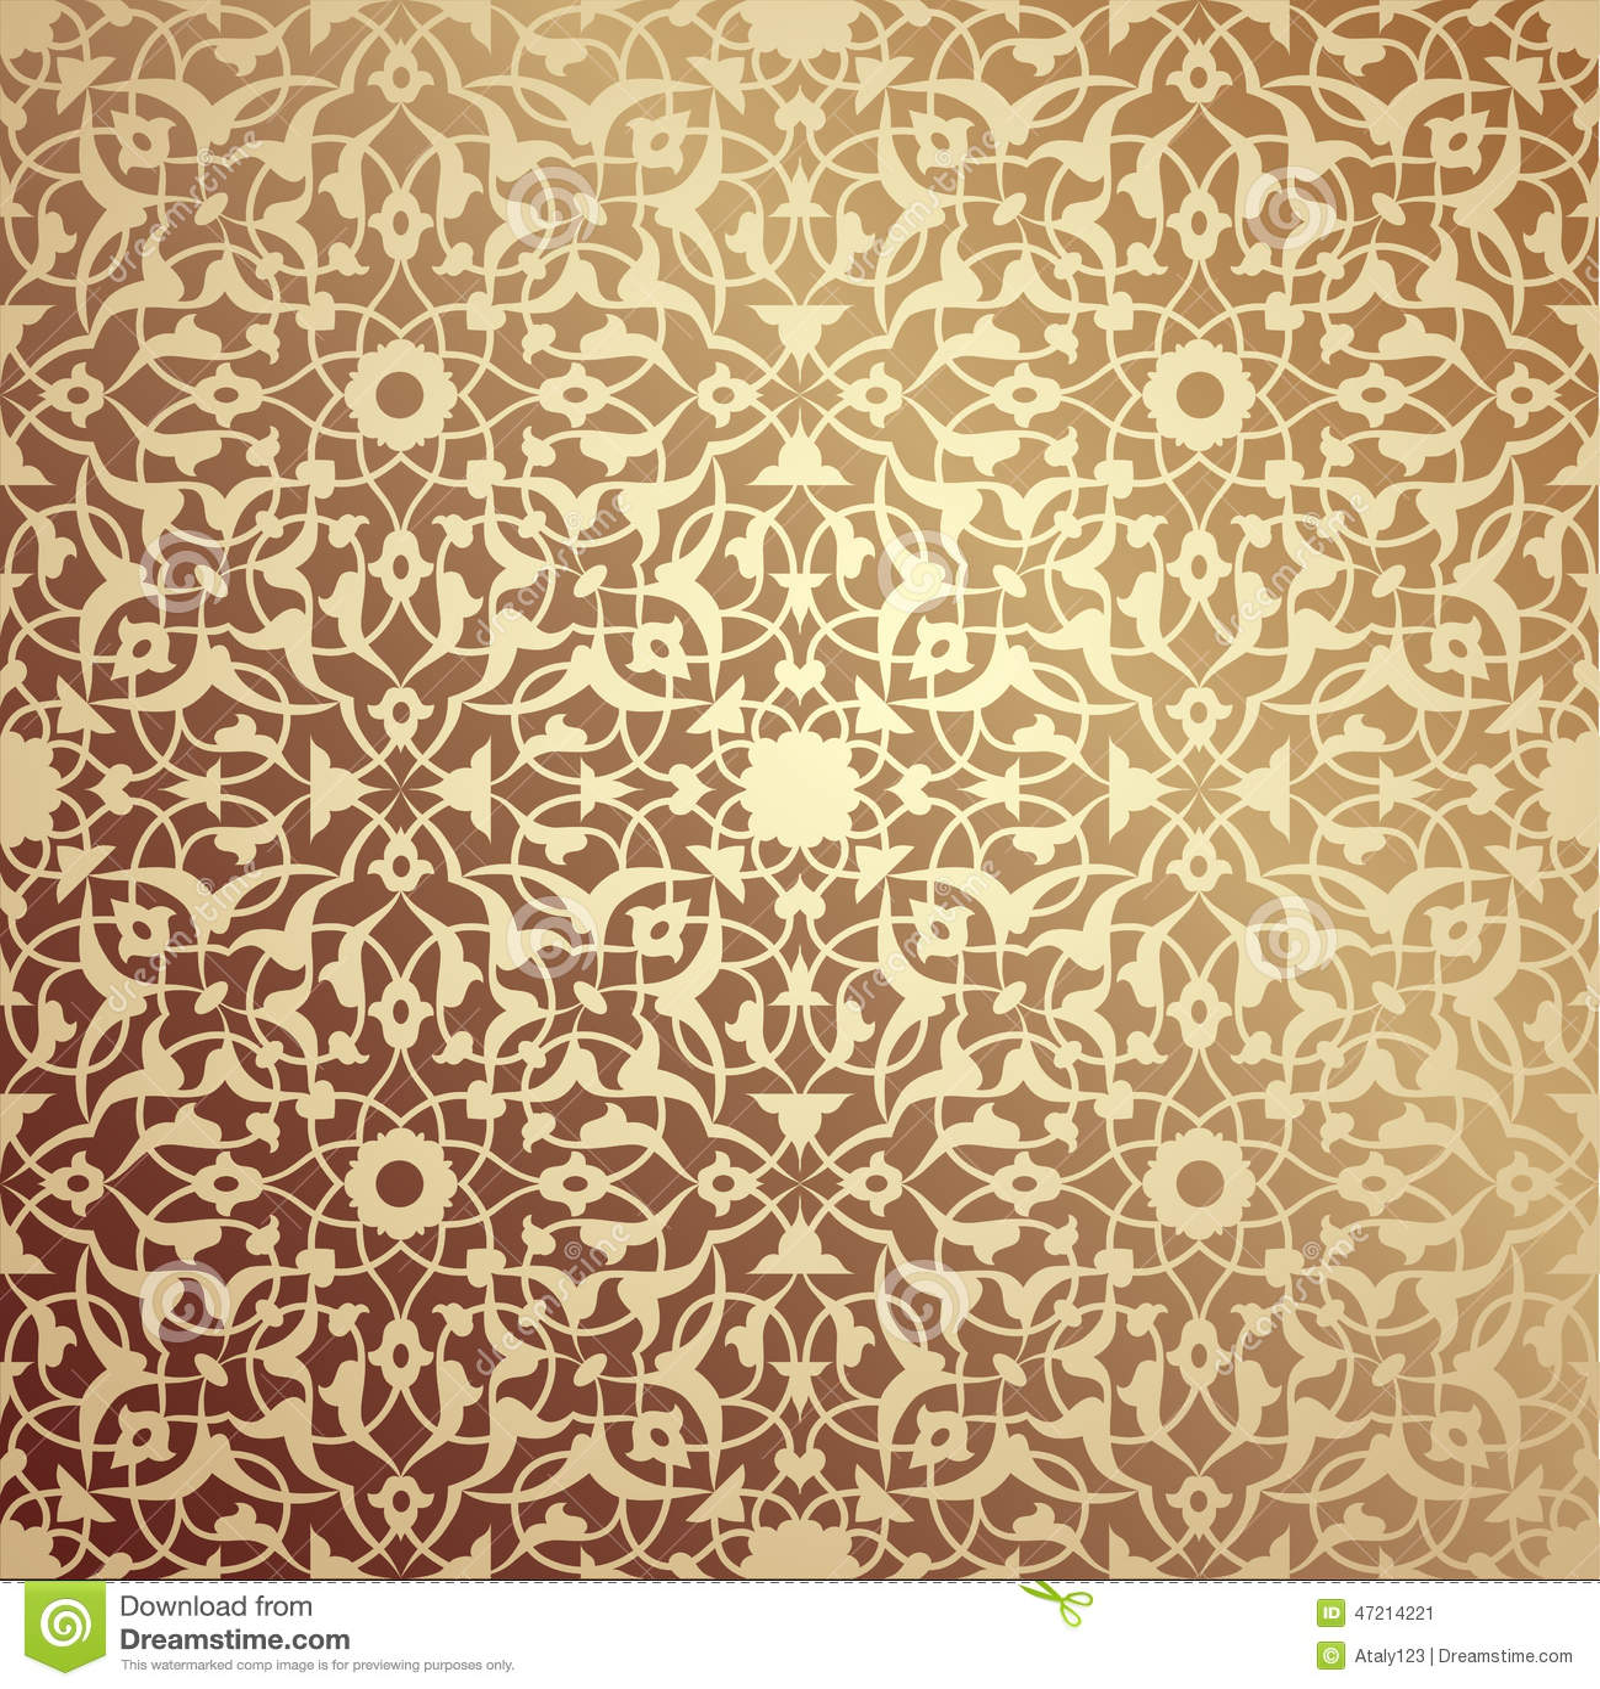 Islamic Pattern Stock Vector - Image: 47214221